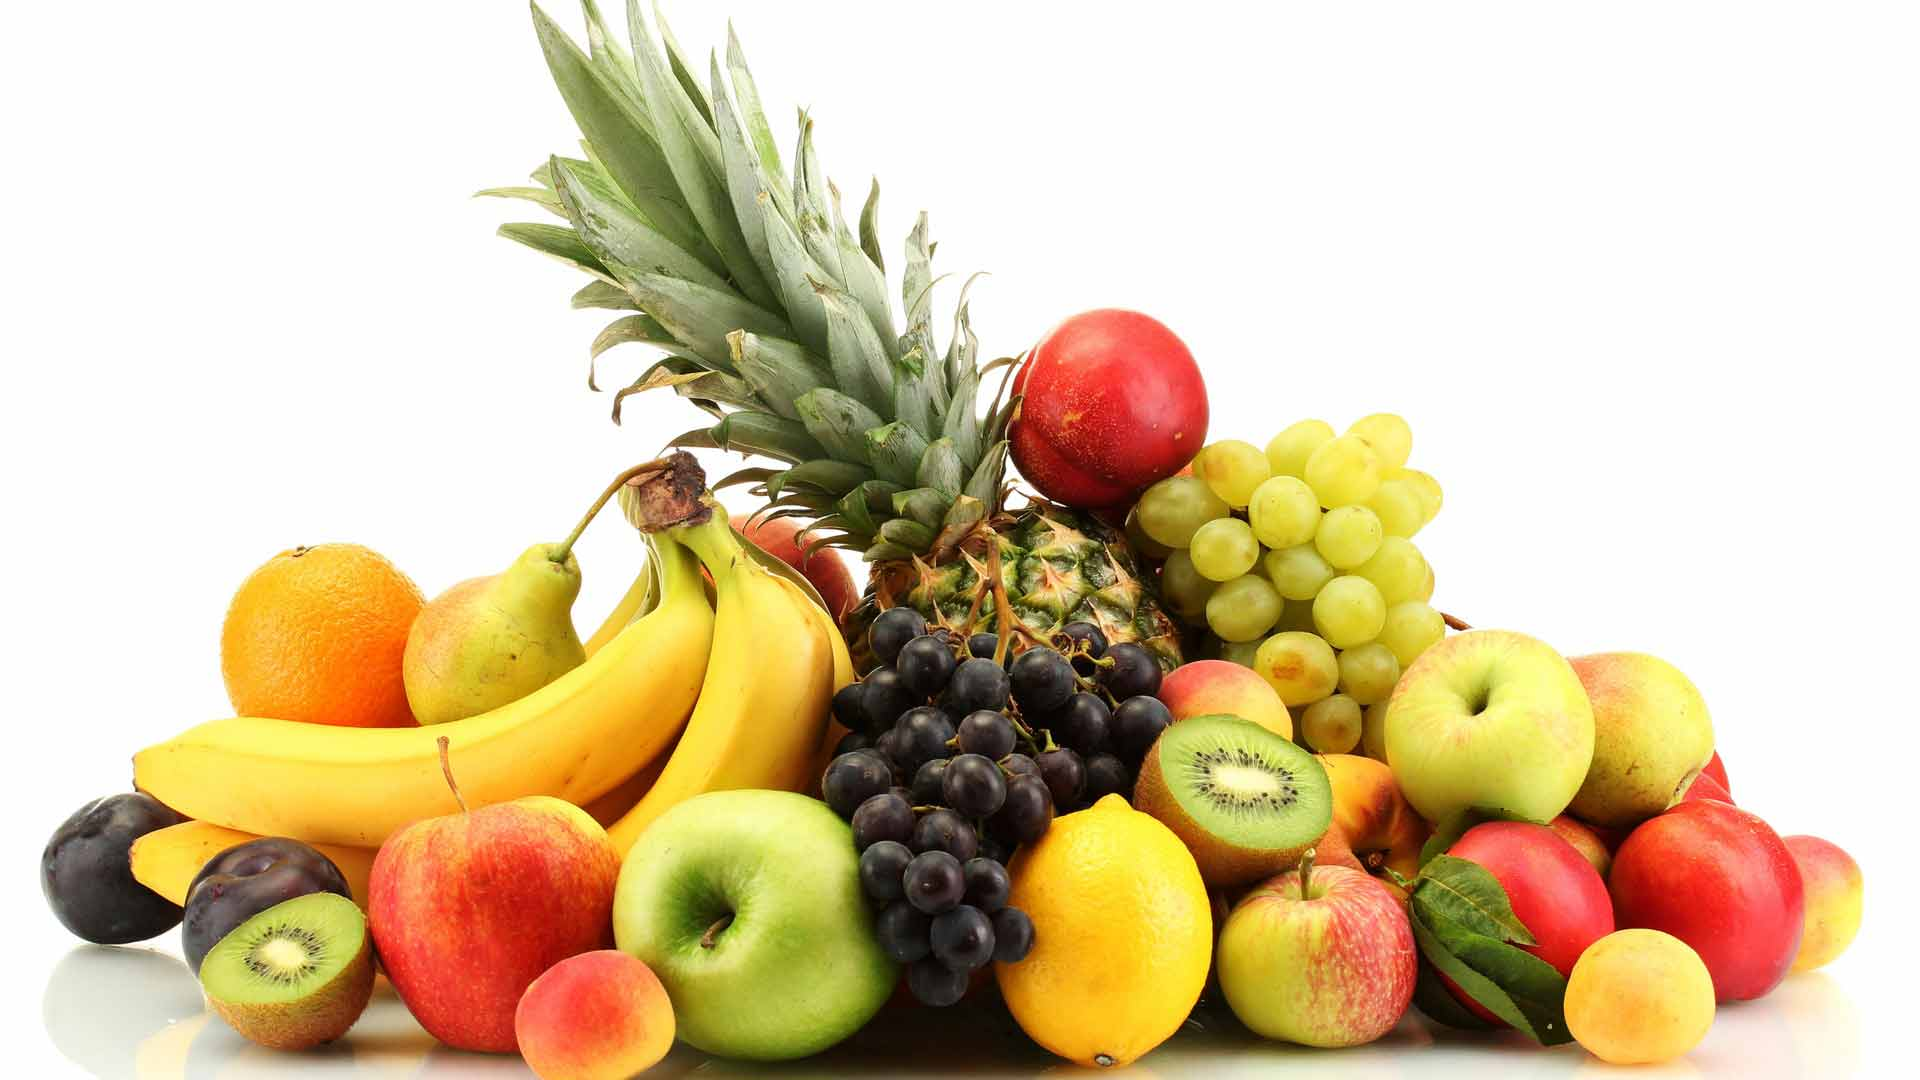 E Vitamini Nedir? E Vitamininin Kanıtlanmış 18 Yararı